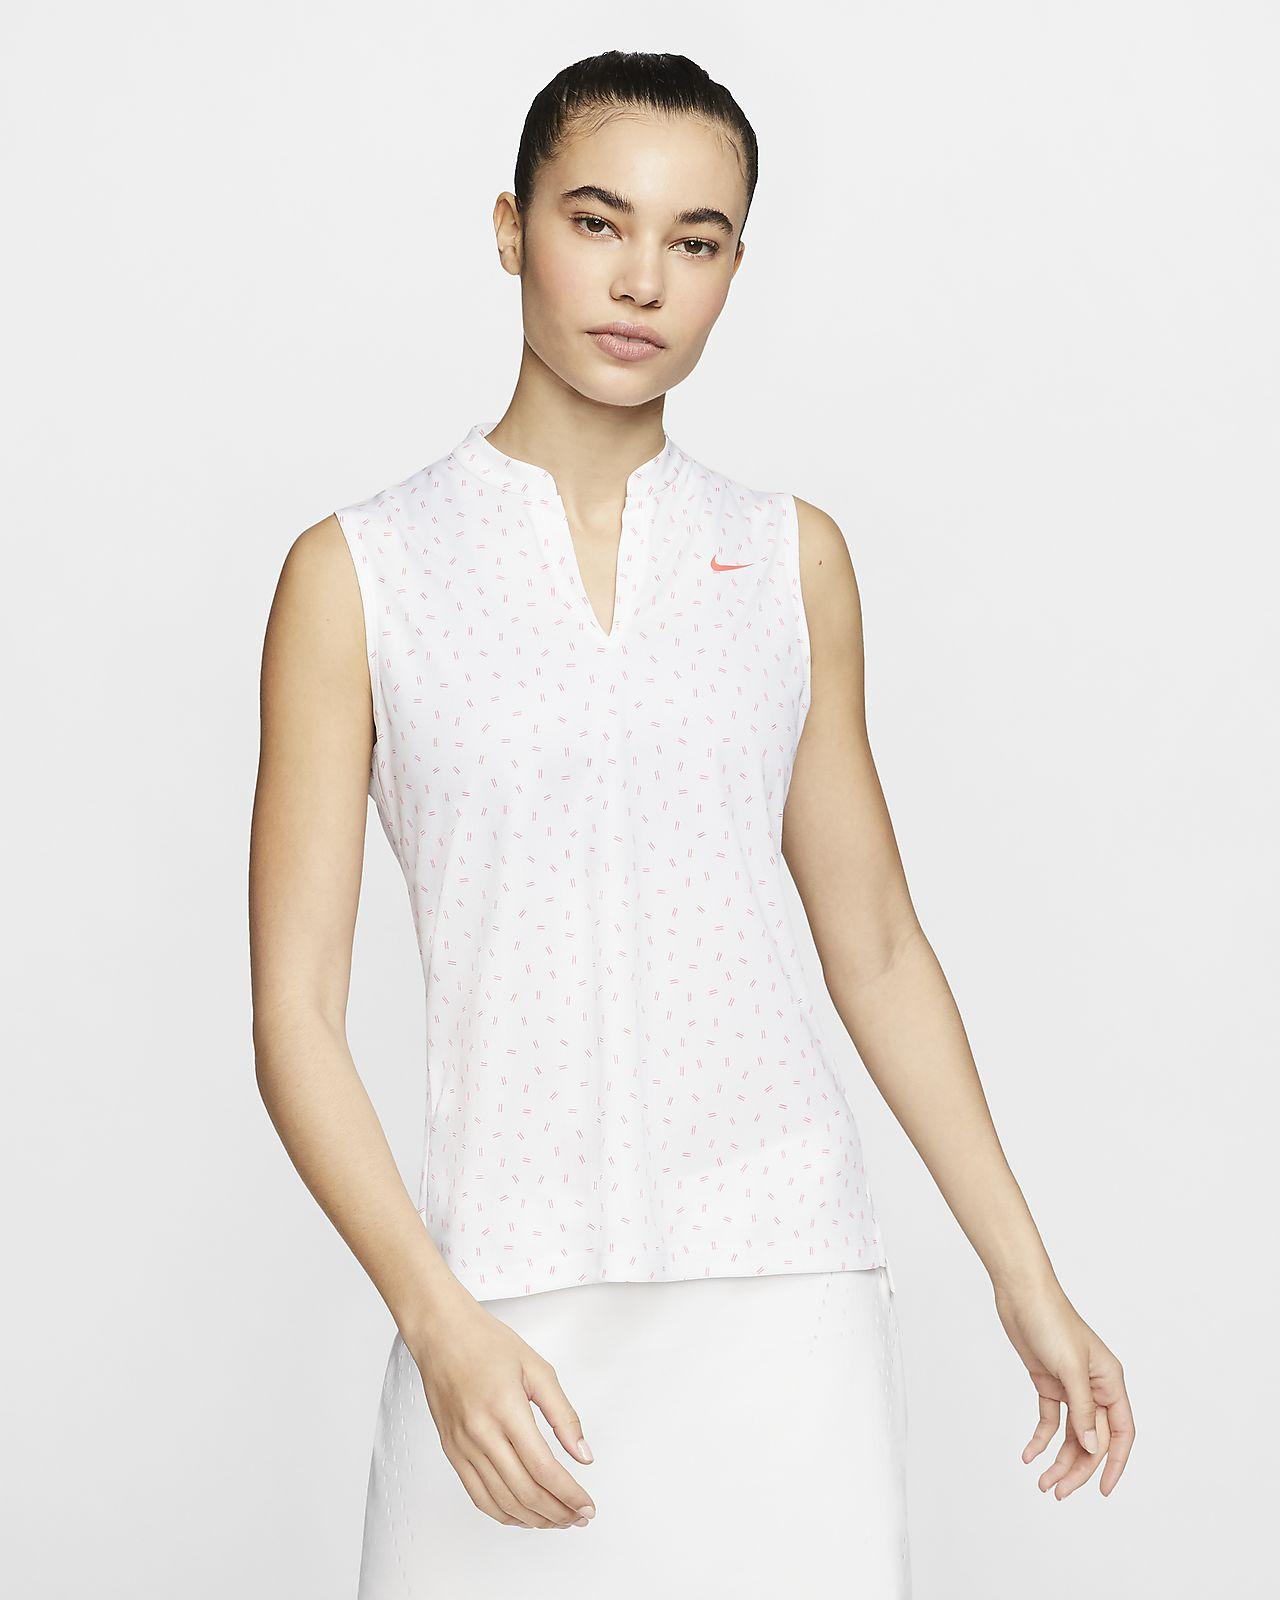 Nike Dri-FIT Victory ärmelloses Golf-Poloshirt mit Print für Damen